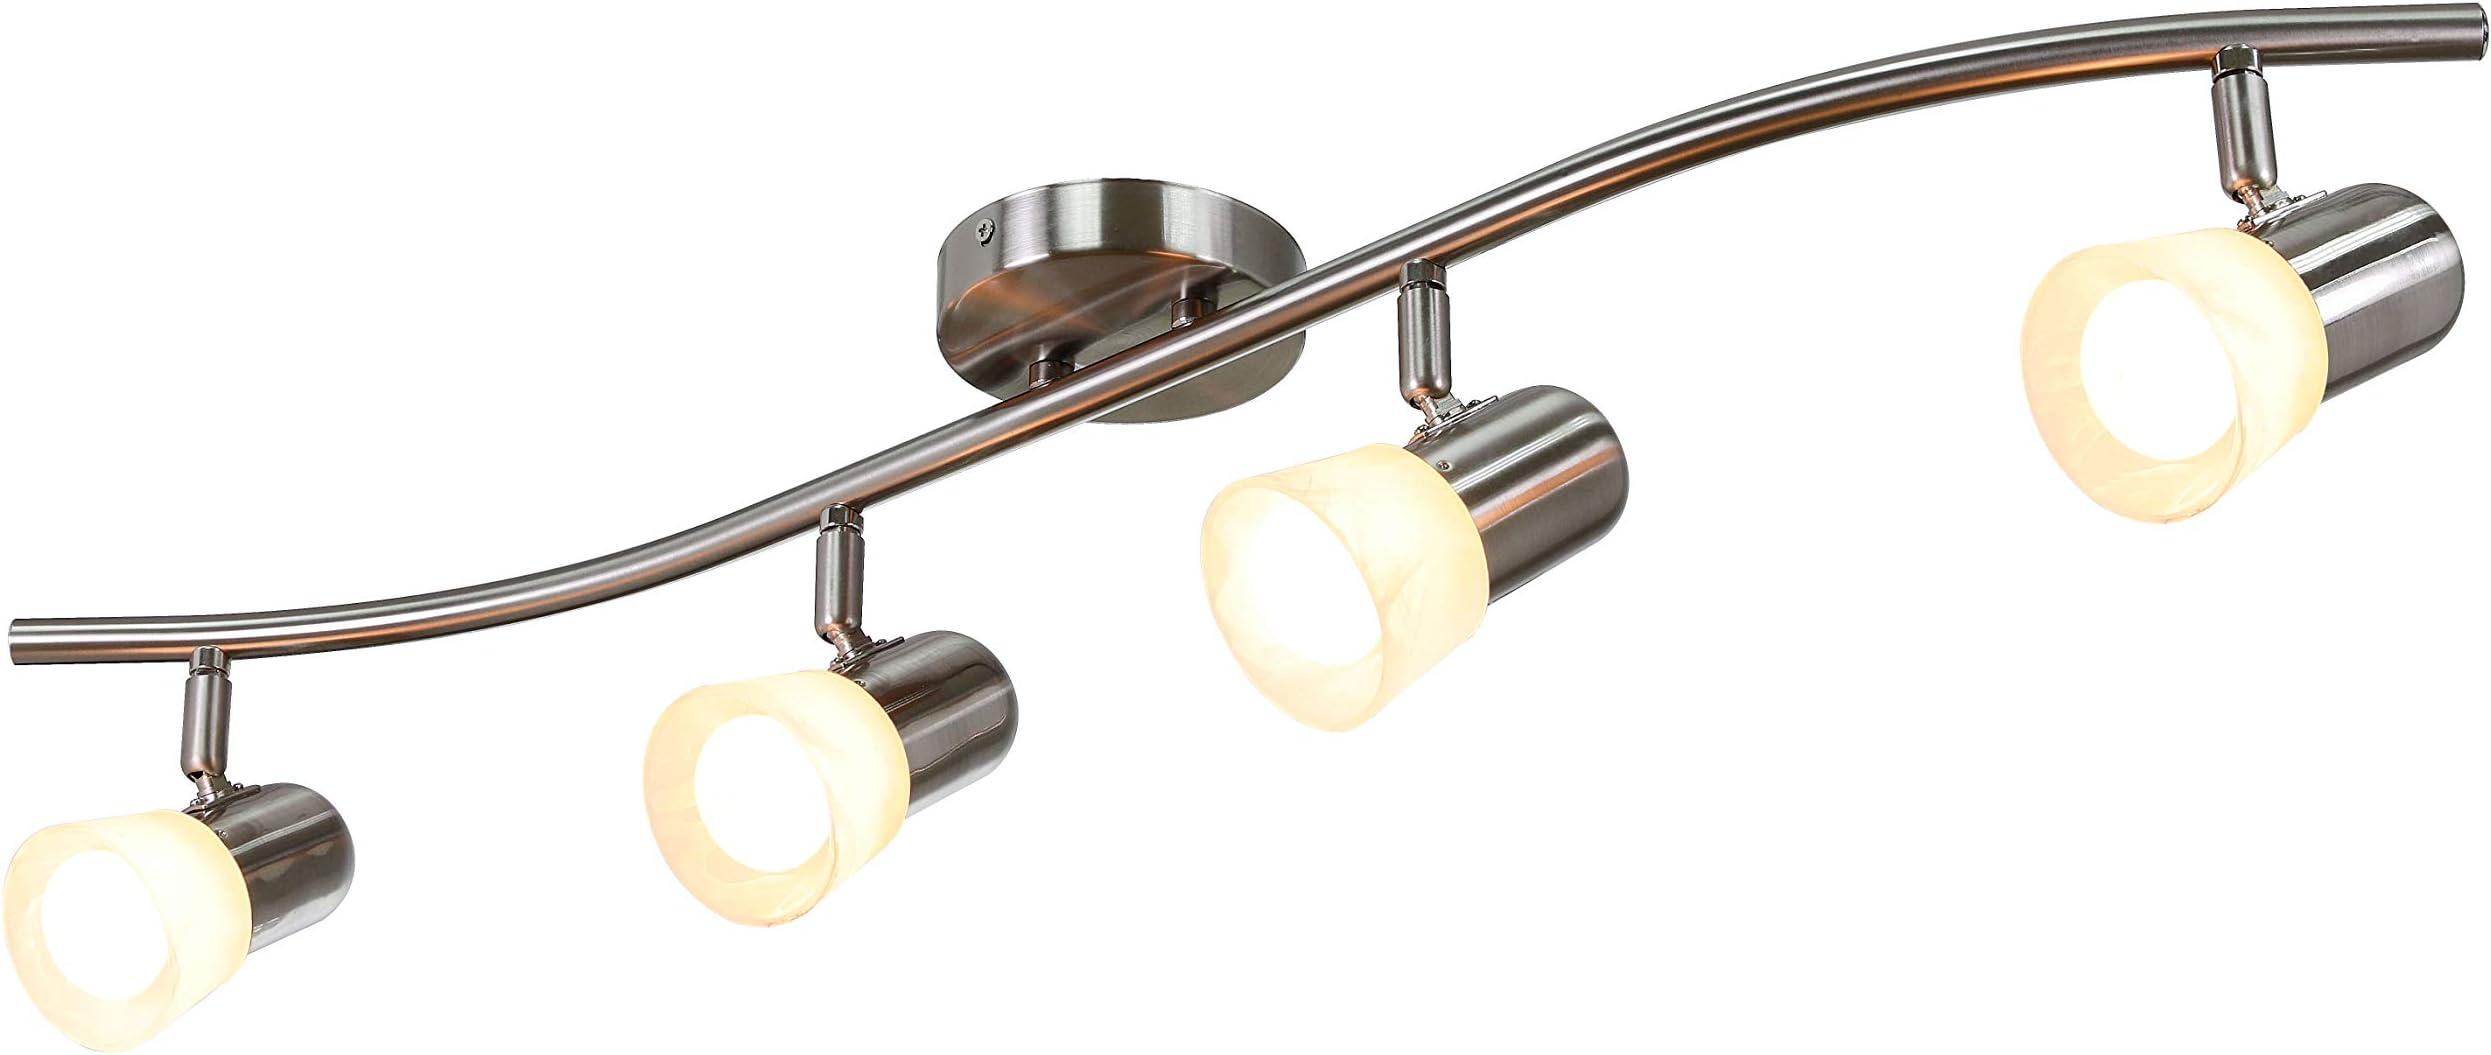 XiNBEi Lighting Track Lighting 4 Light Track Light with Alabaster Glass, Modern Track Light Bar in Brushed Nickel for Kitchen & Living Room XB-TR1213-4